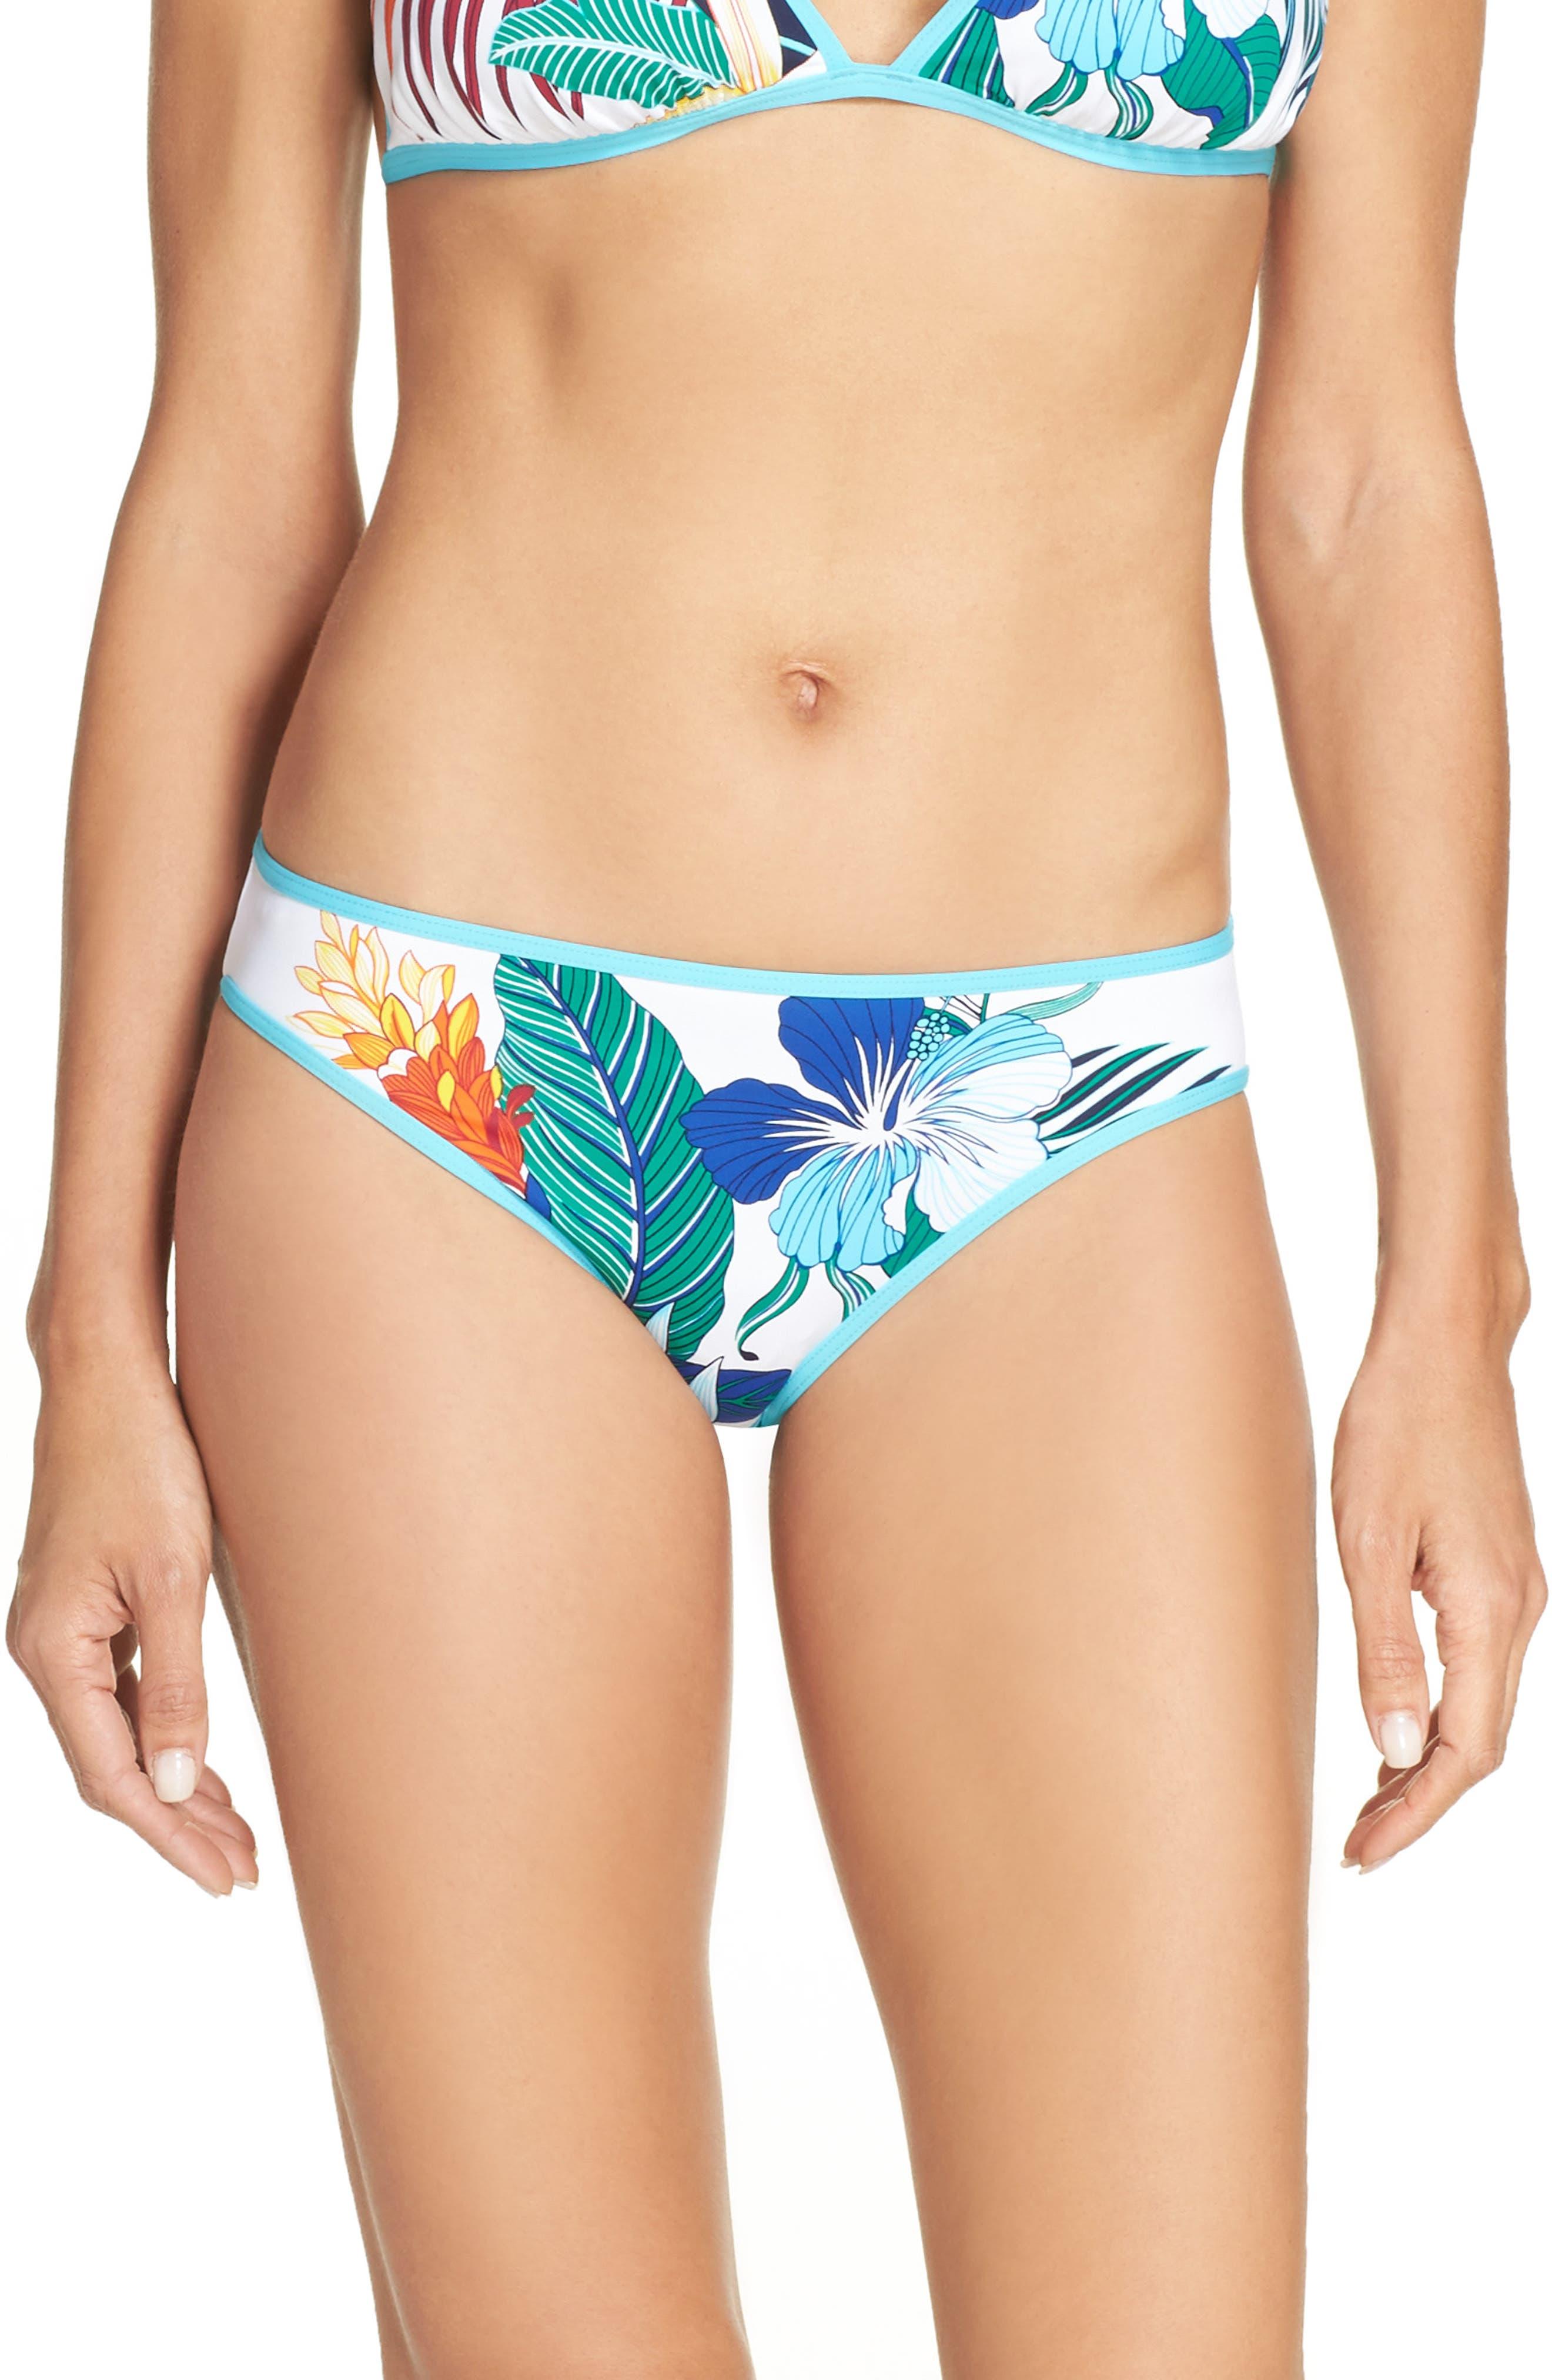 Hibiscus Print Bikini Bottoms,                         Main,                         color, 100